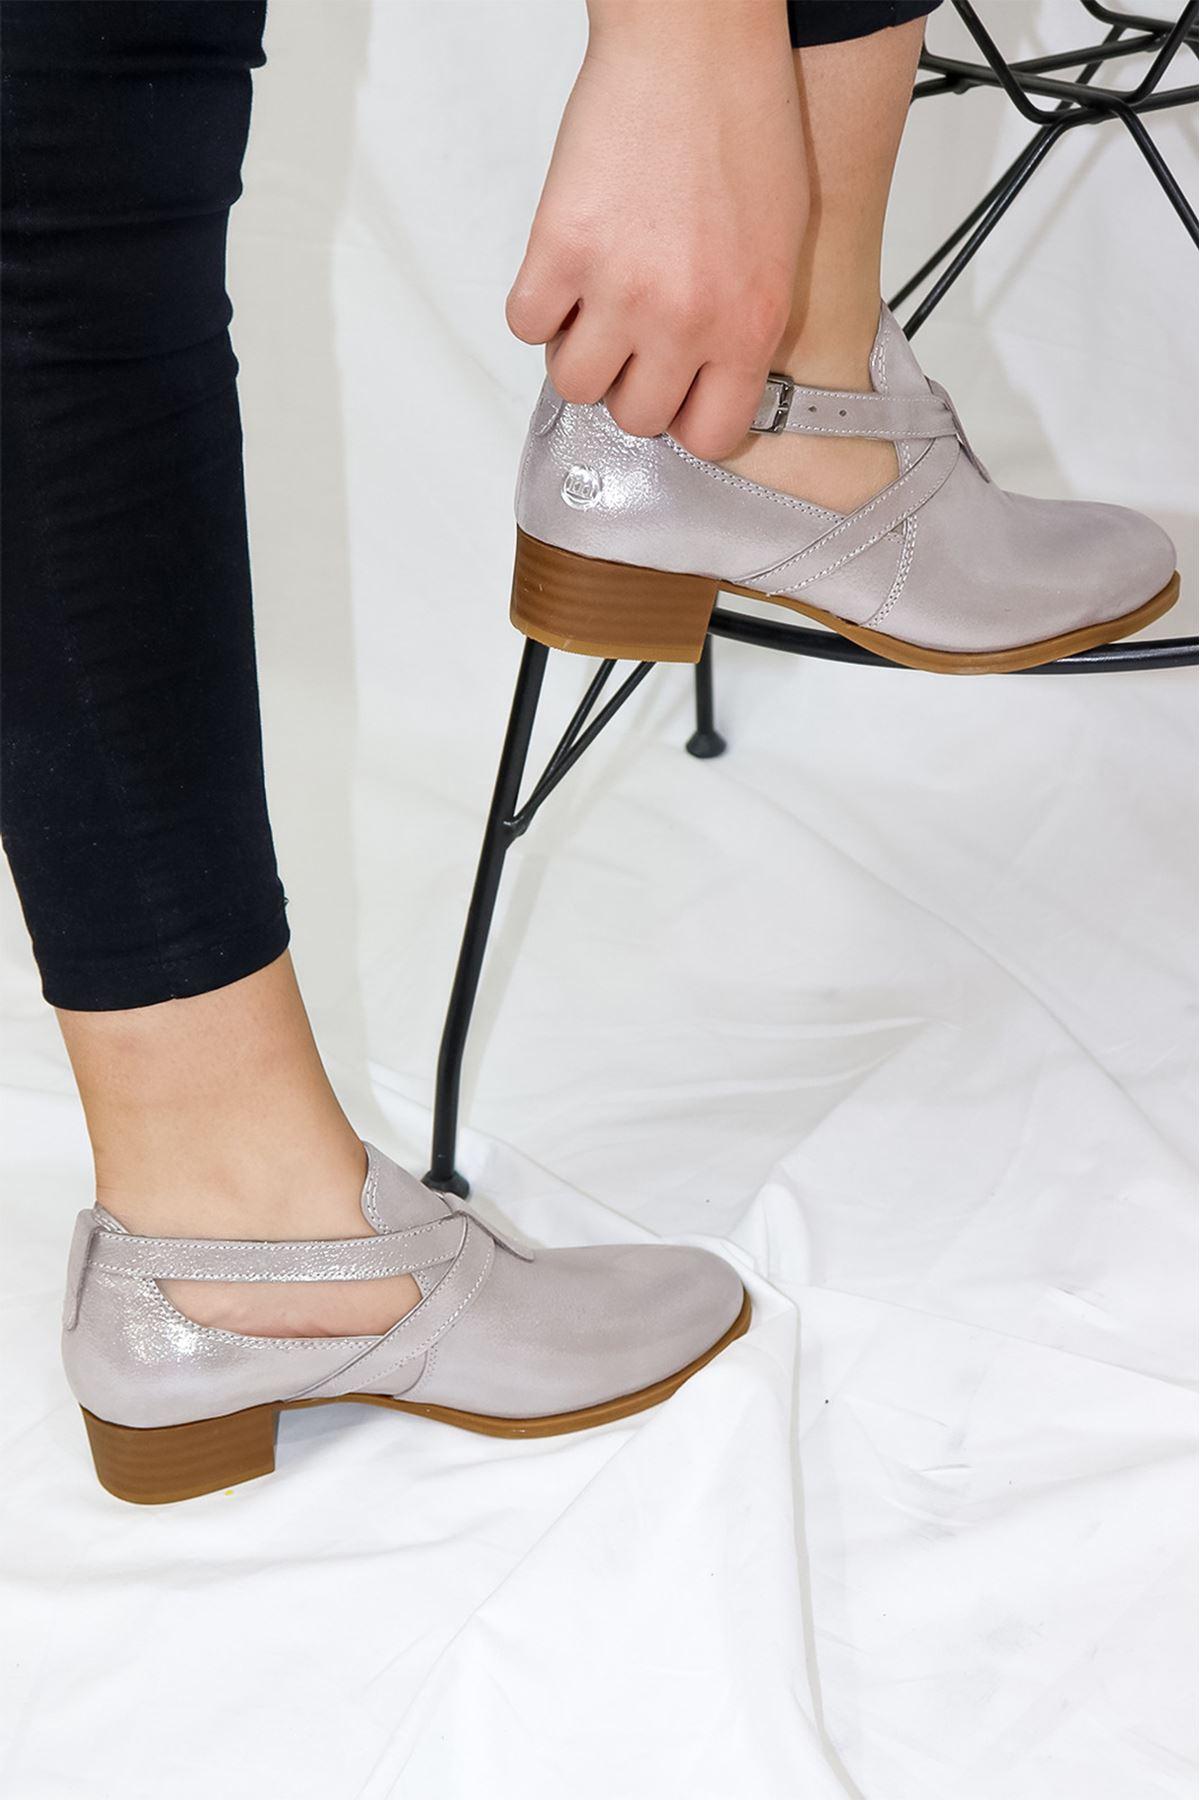 Mammamia - D21YA - 90-B Gri Simli Kadın Ayakkabısı